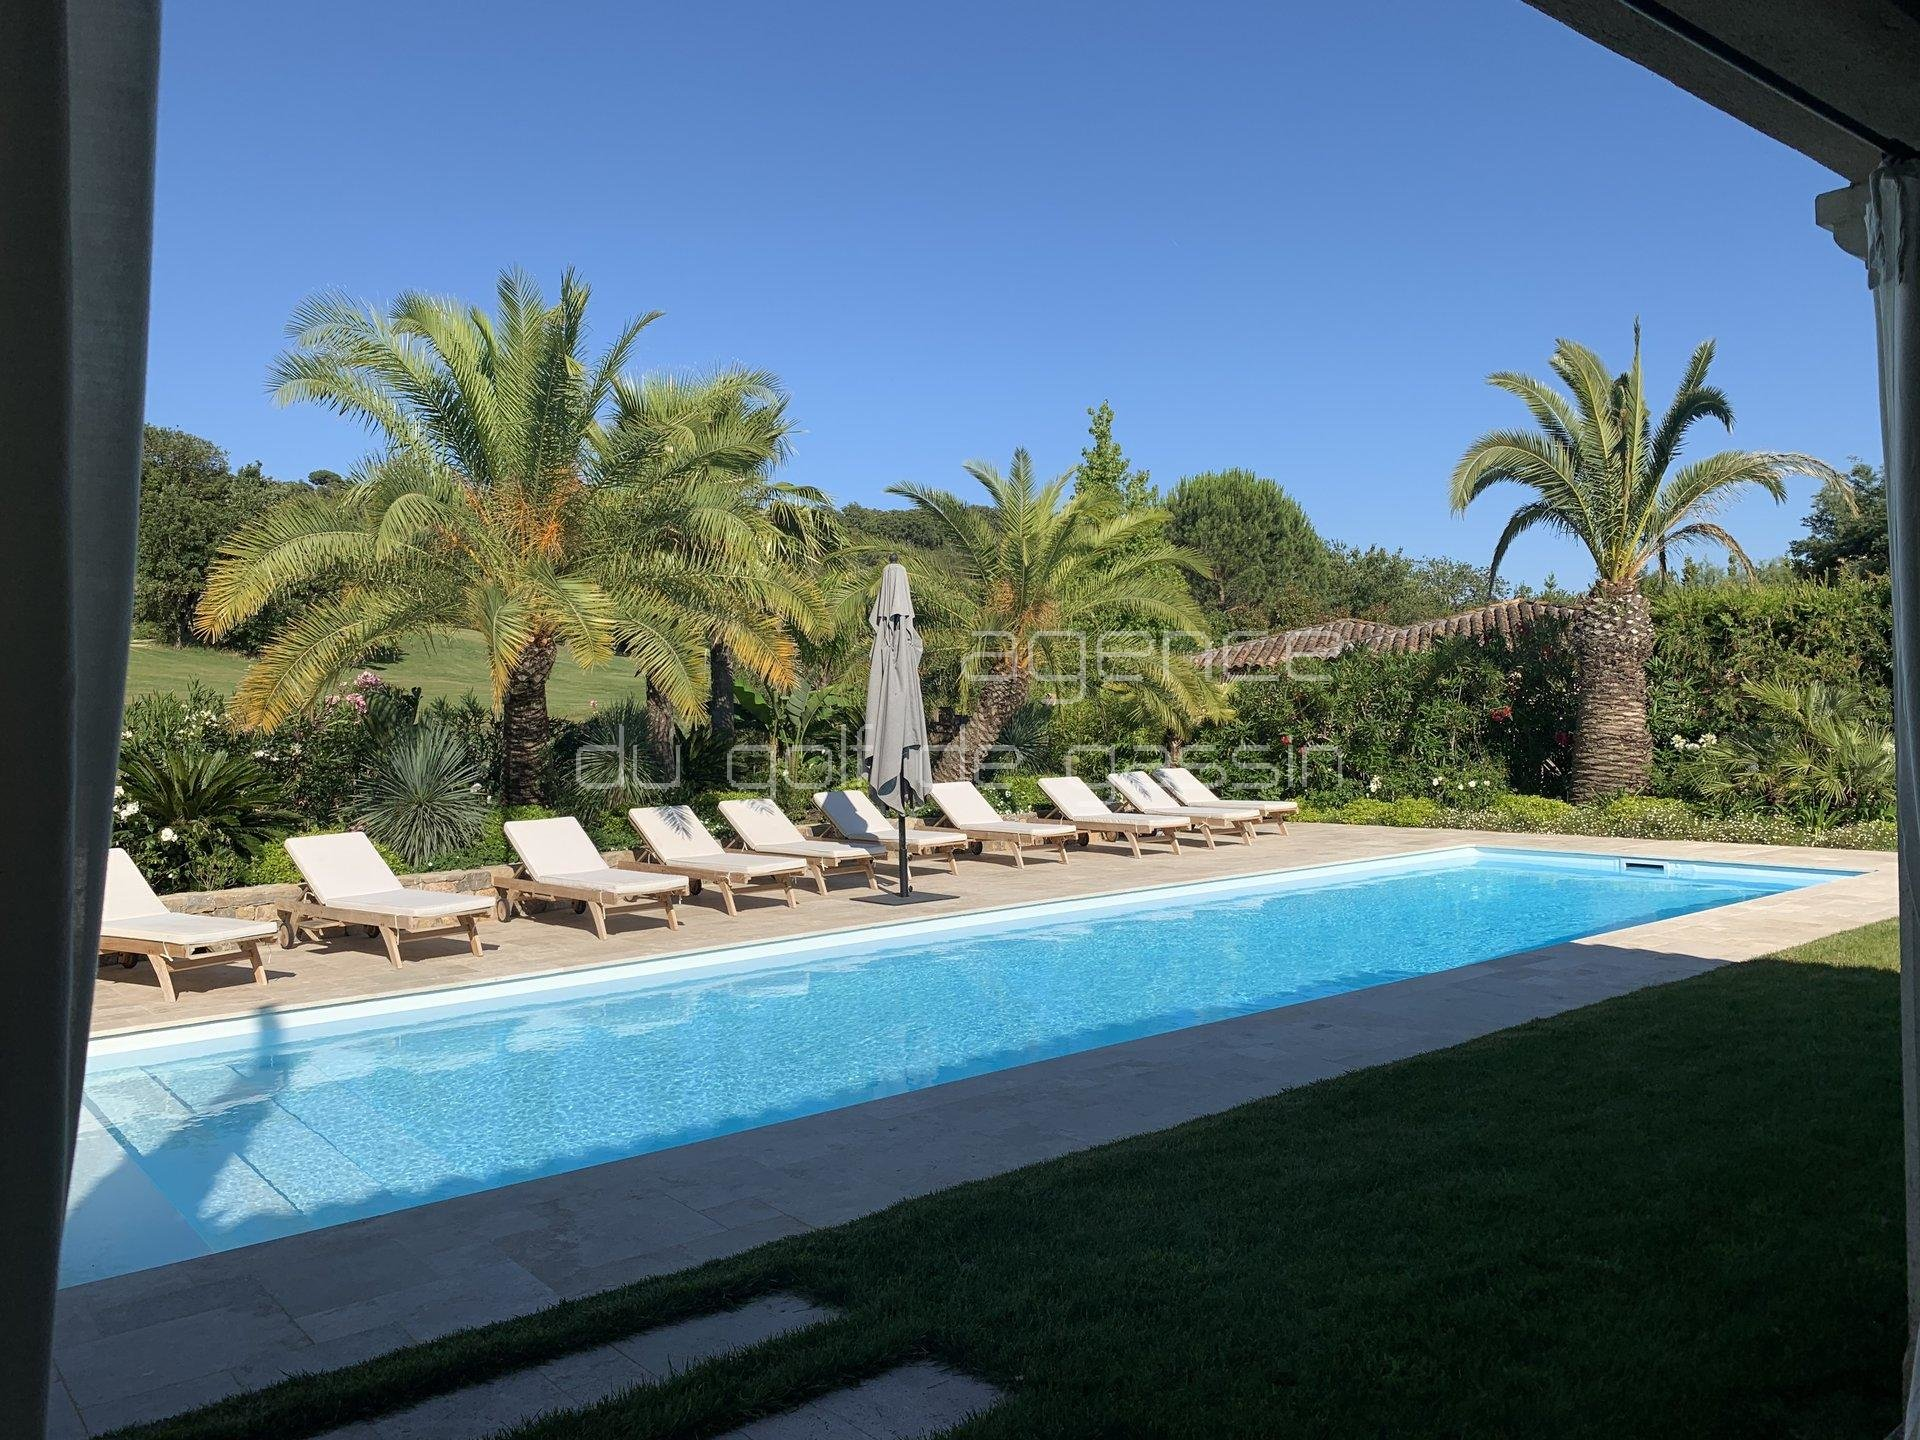 Saint Tropez Gassin  Villa AUGUSTA 3 bedrooms villa secured domain